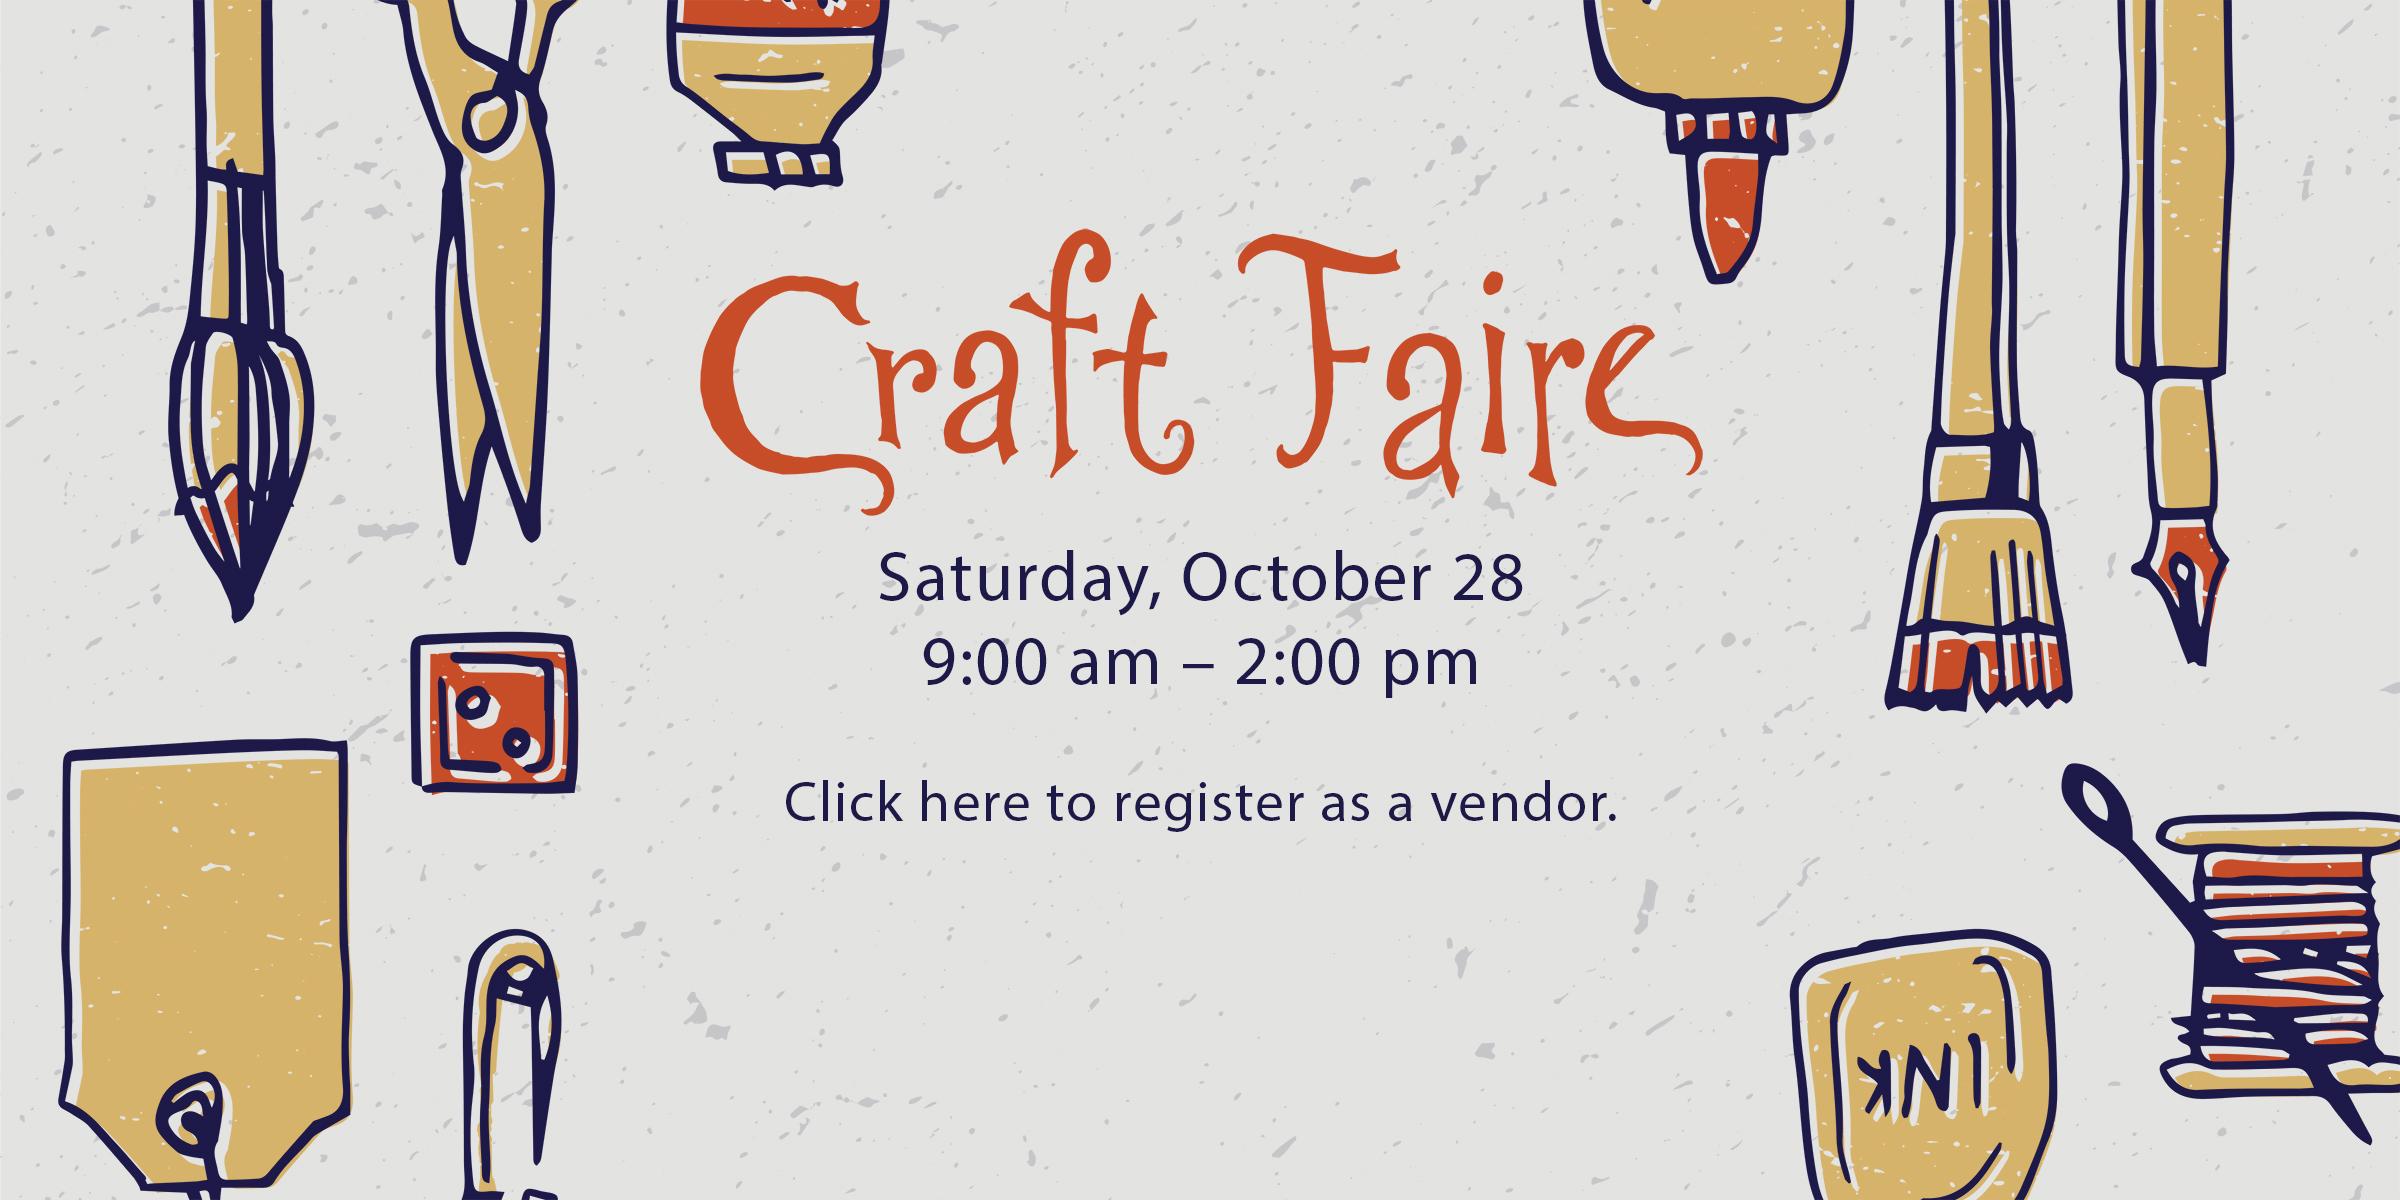 web-slider-CraftFaire-sell-crafts1